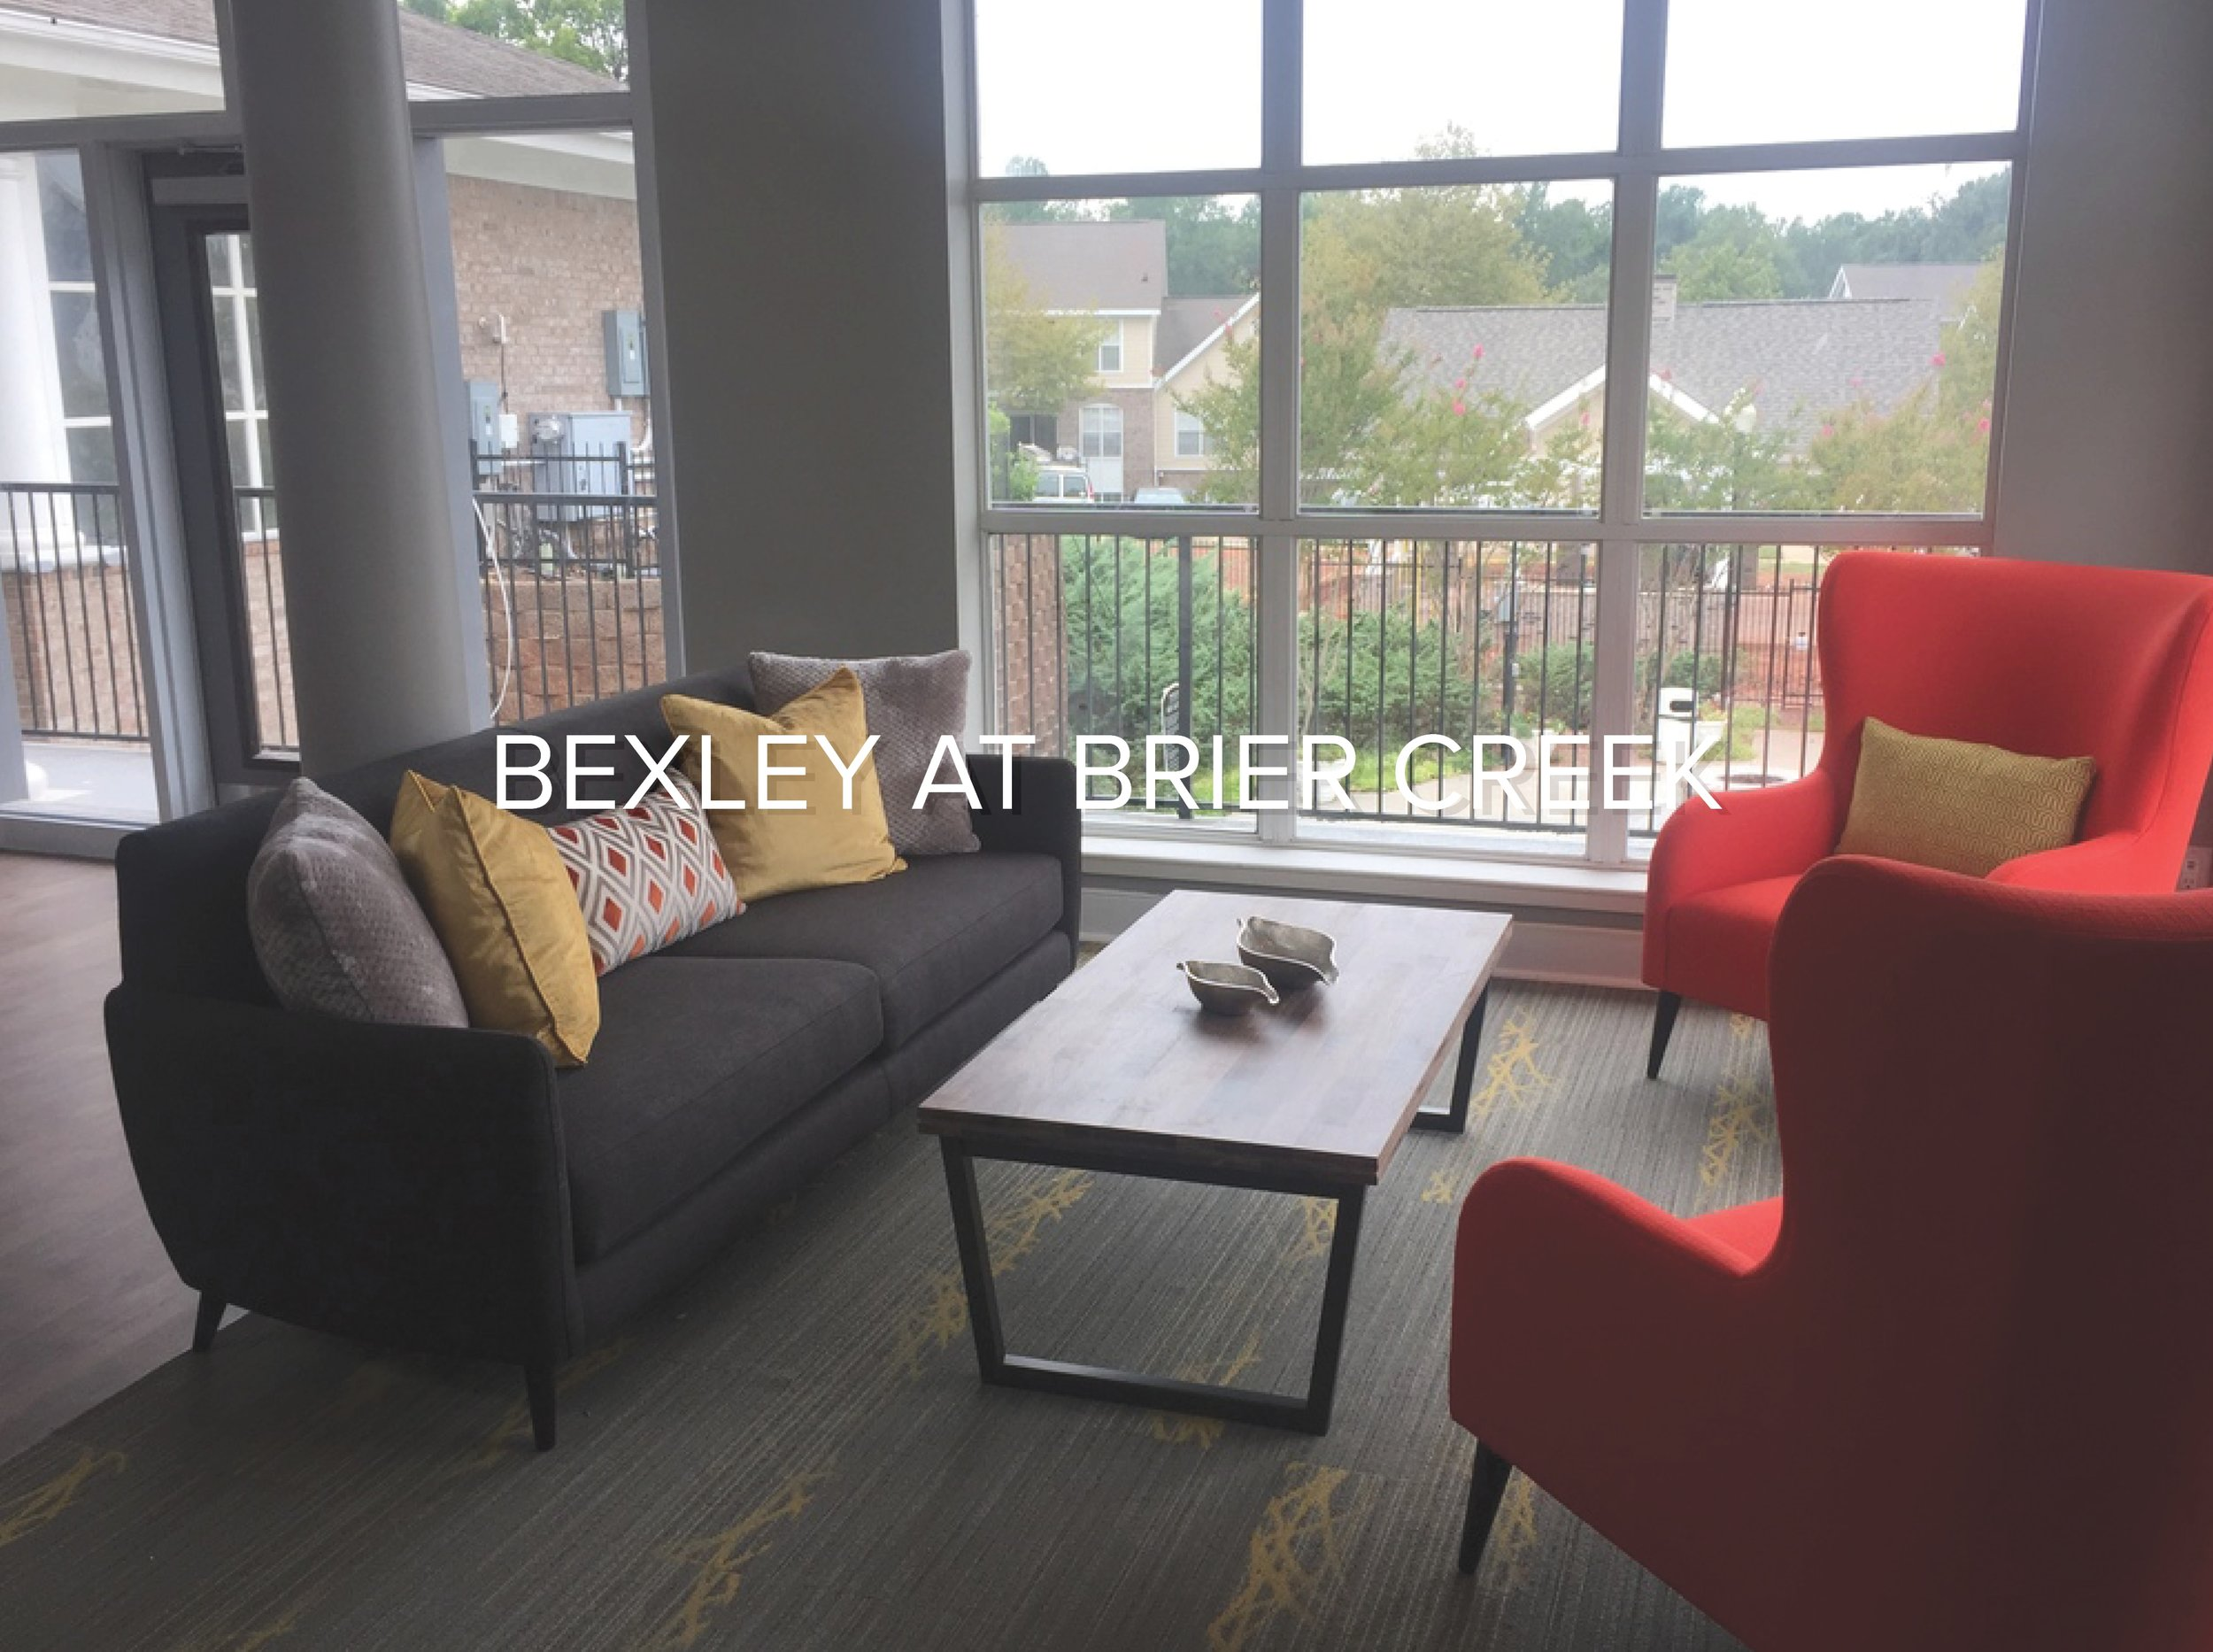 Bexley at Brier Creek.jpg